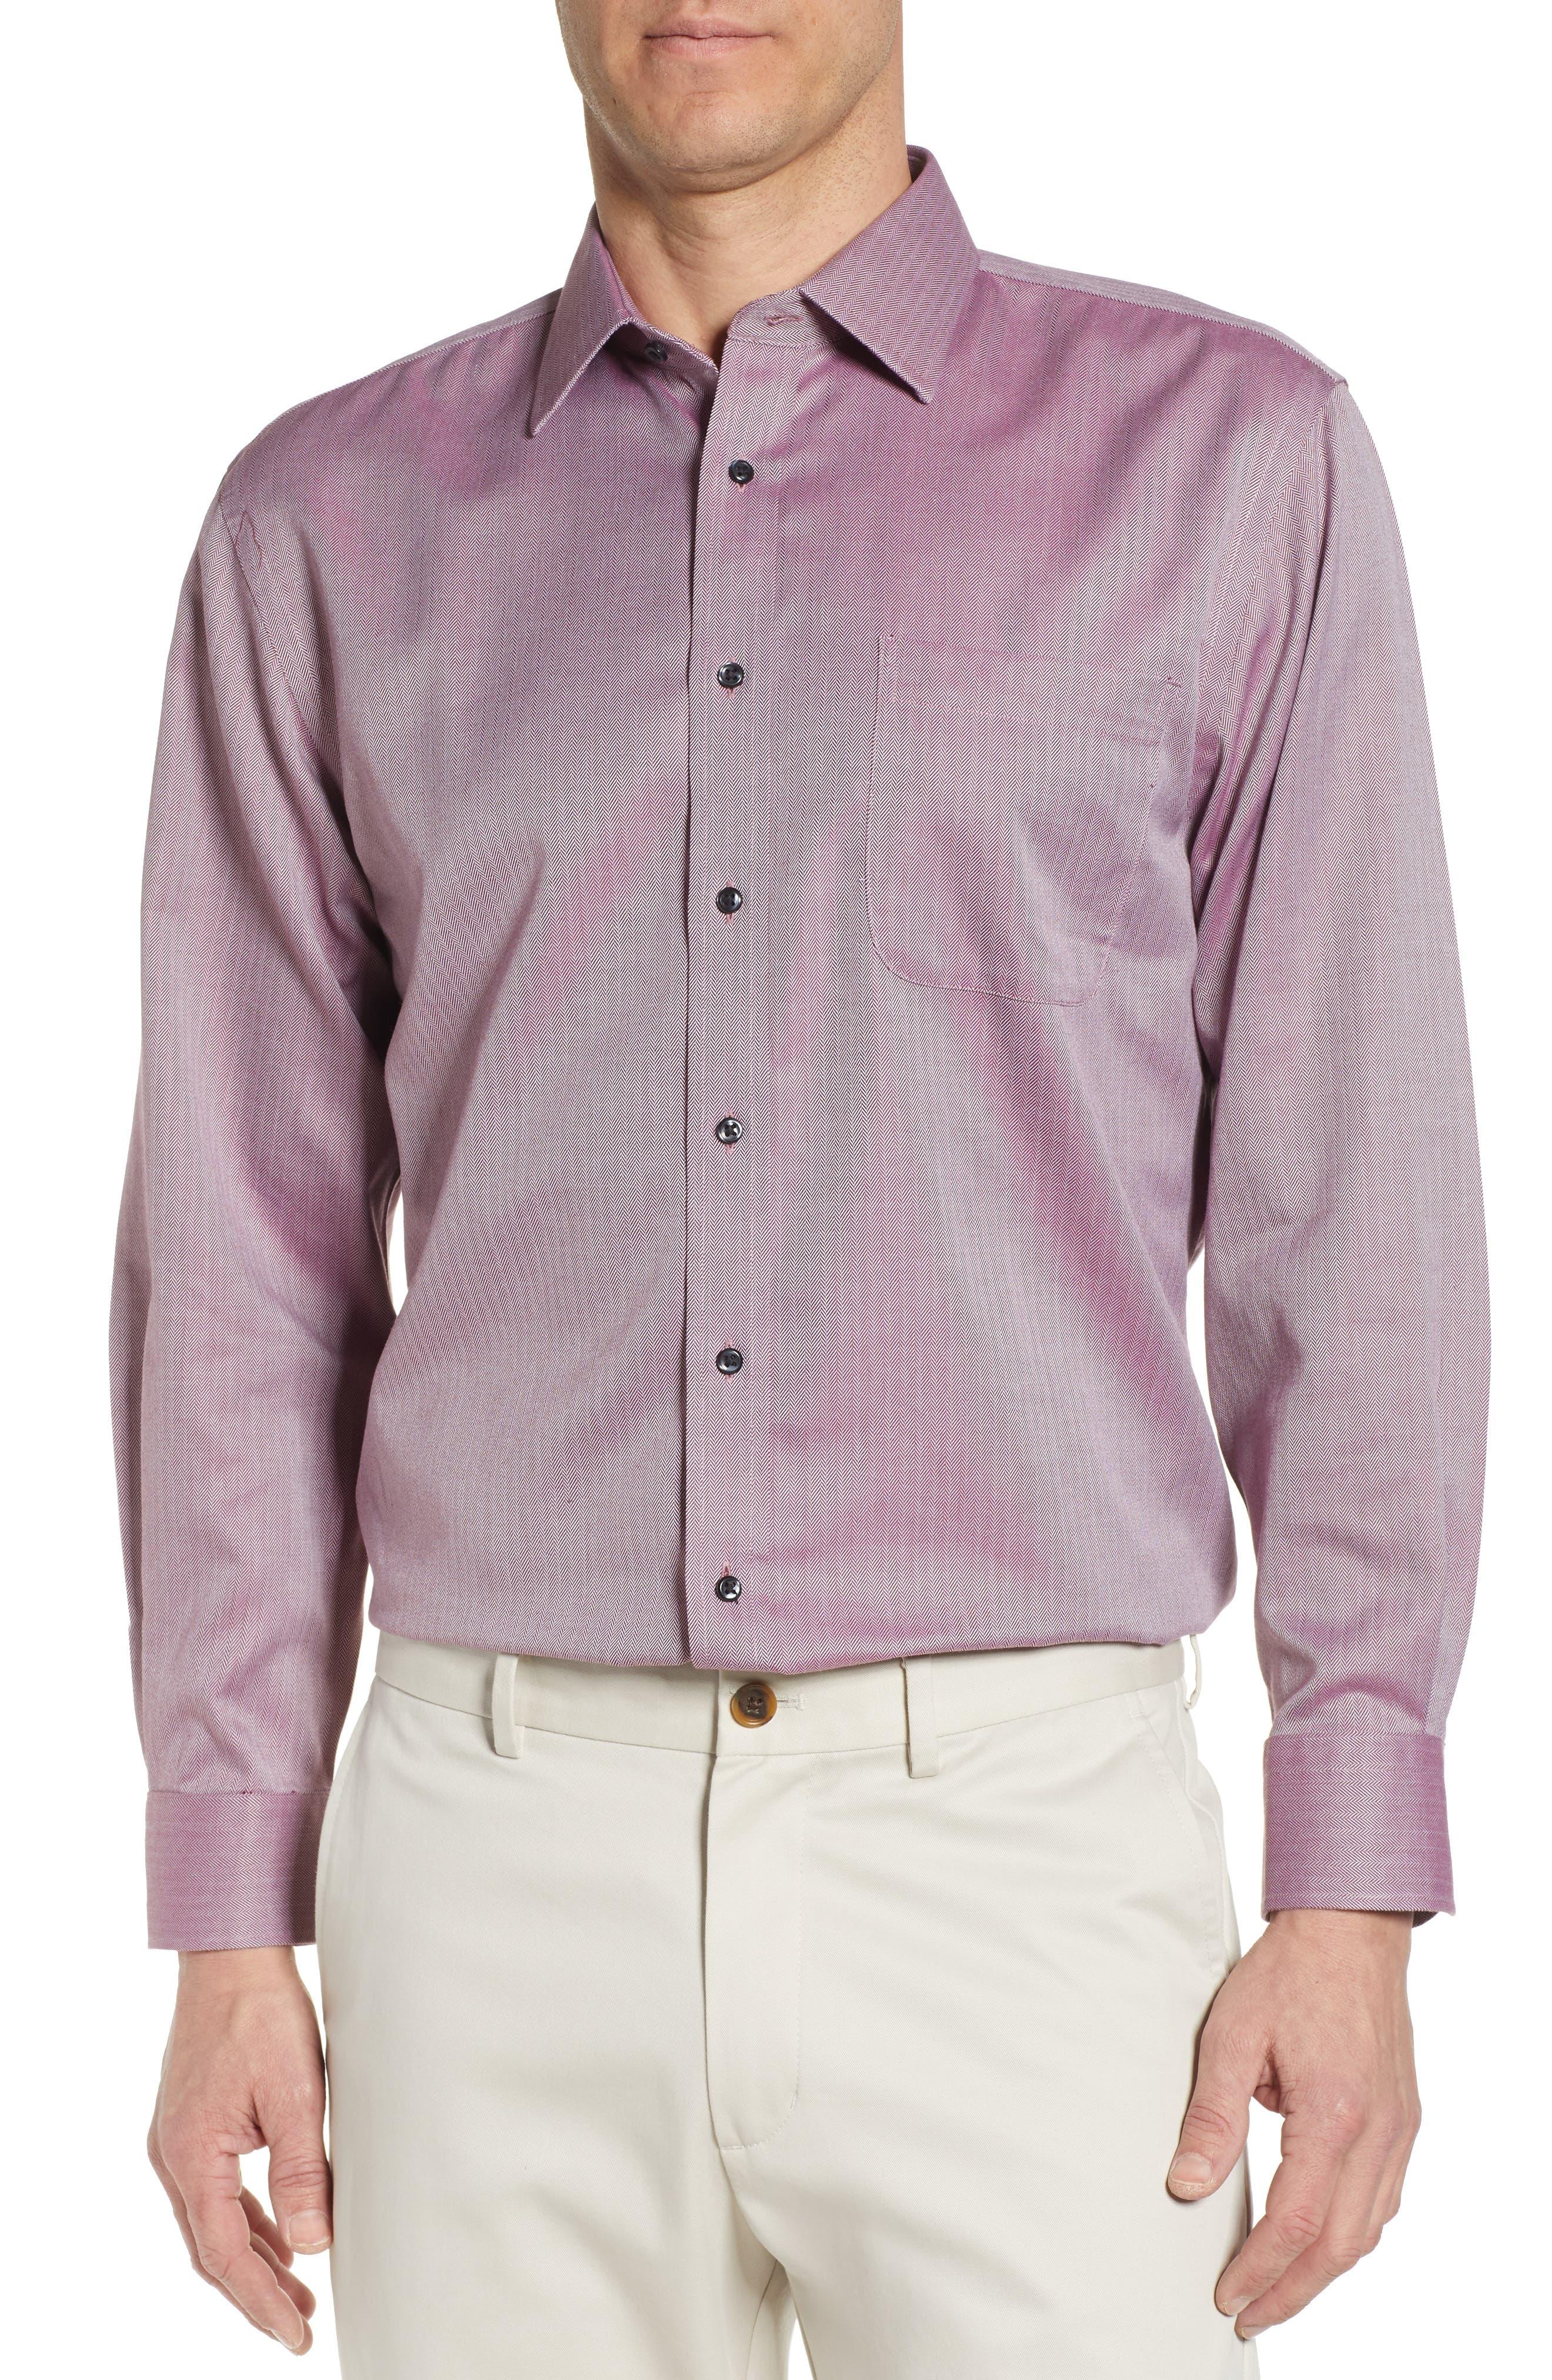 NORDSTROM MEN'S SHOP Smartcare<sup>™</sup> Traditional Fit Herringbone Dress Shirt, Main, color, BURGUNDY ROYALE